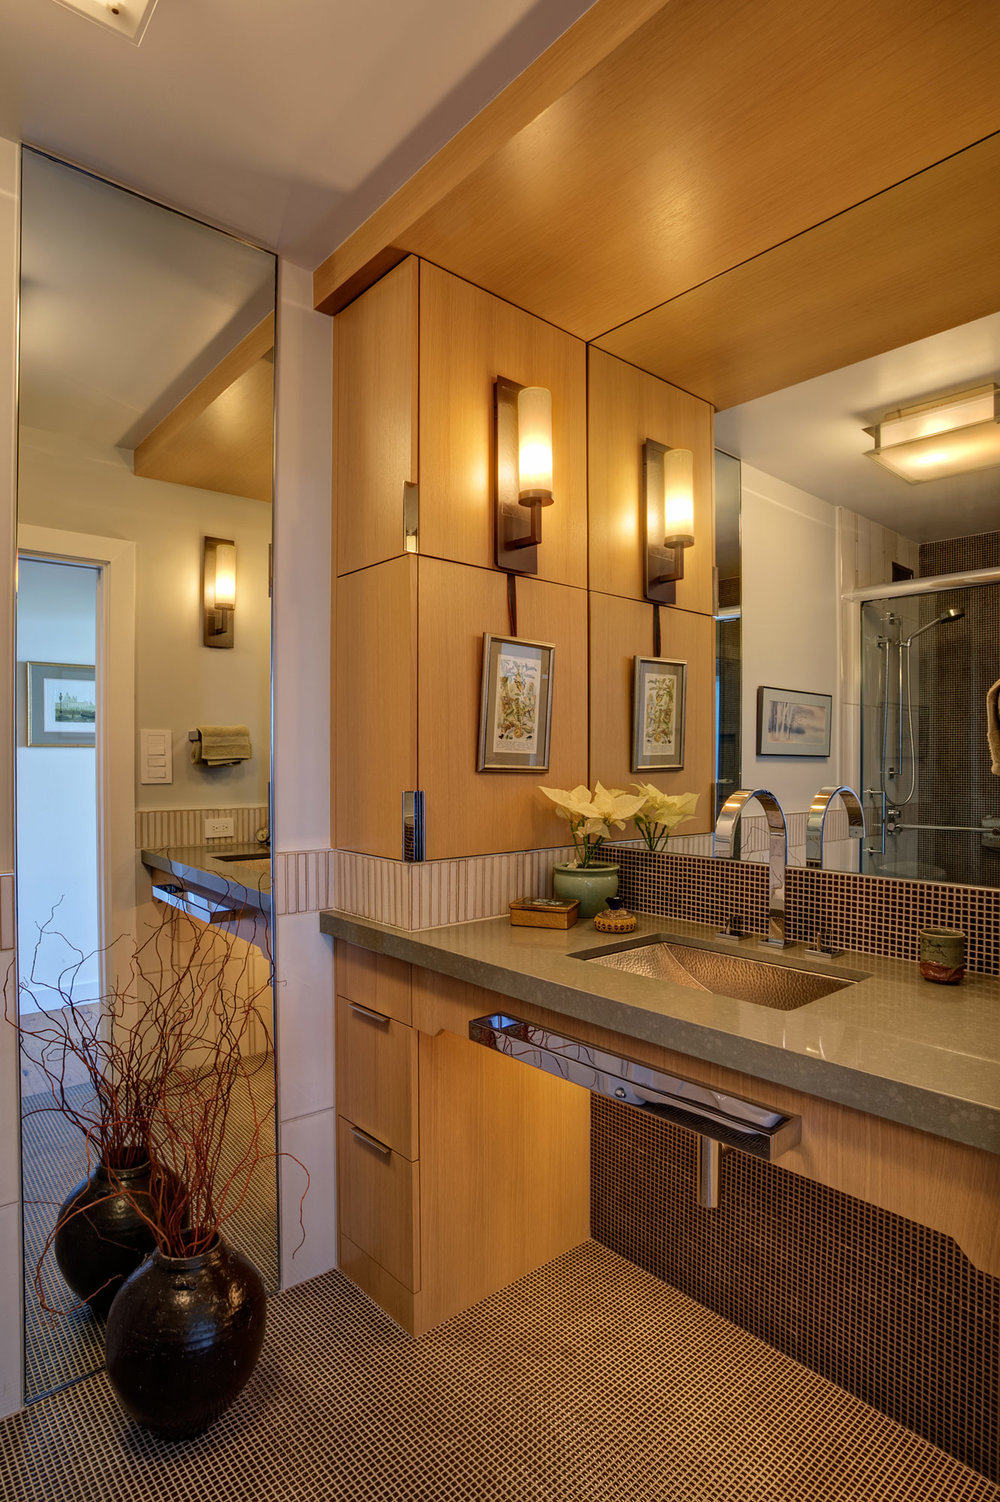 Kaplan-Architects-high-rise-interior-guest-bathroom-vanity.jpg